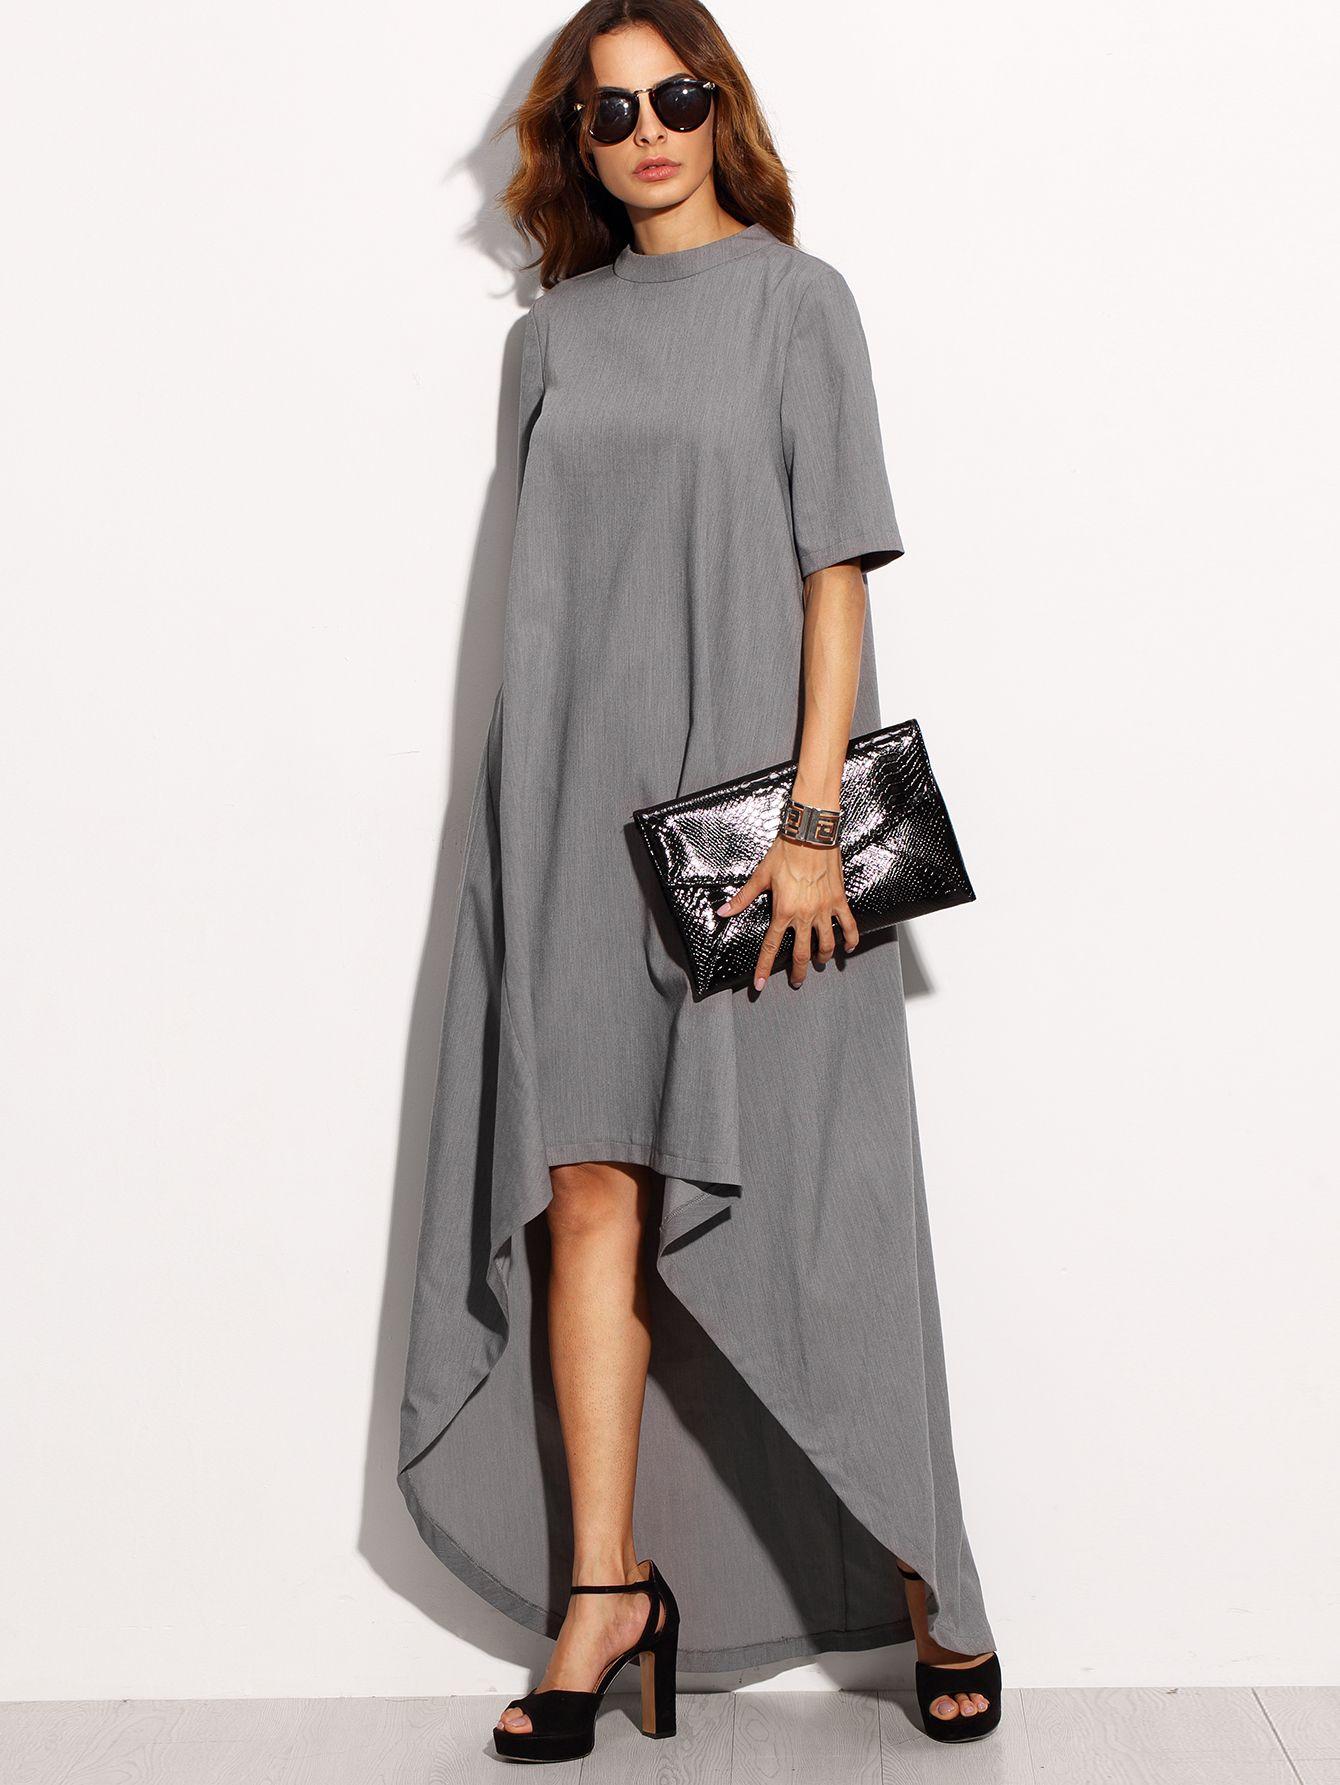 Grey High Neck Short Sleeve High Low Dress 27 00 Maxi Dress With Sleeves Short Sleeve Maxi Dresses High Low Dress [ 1785 x 1340 Pixel ]